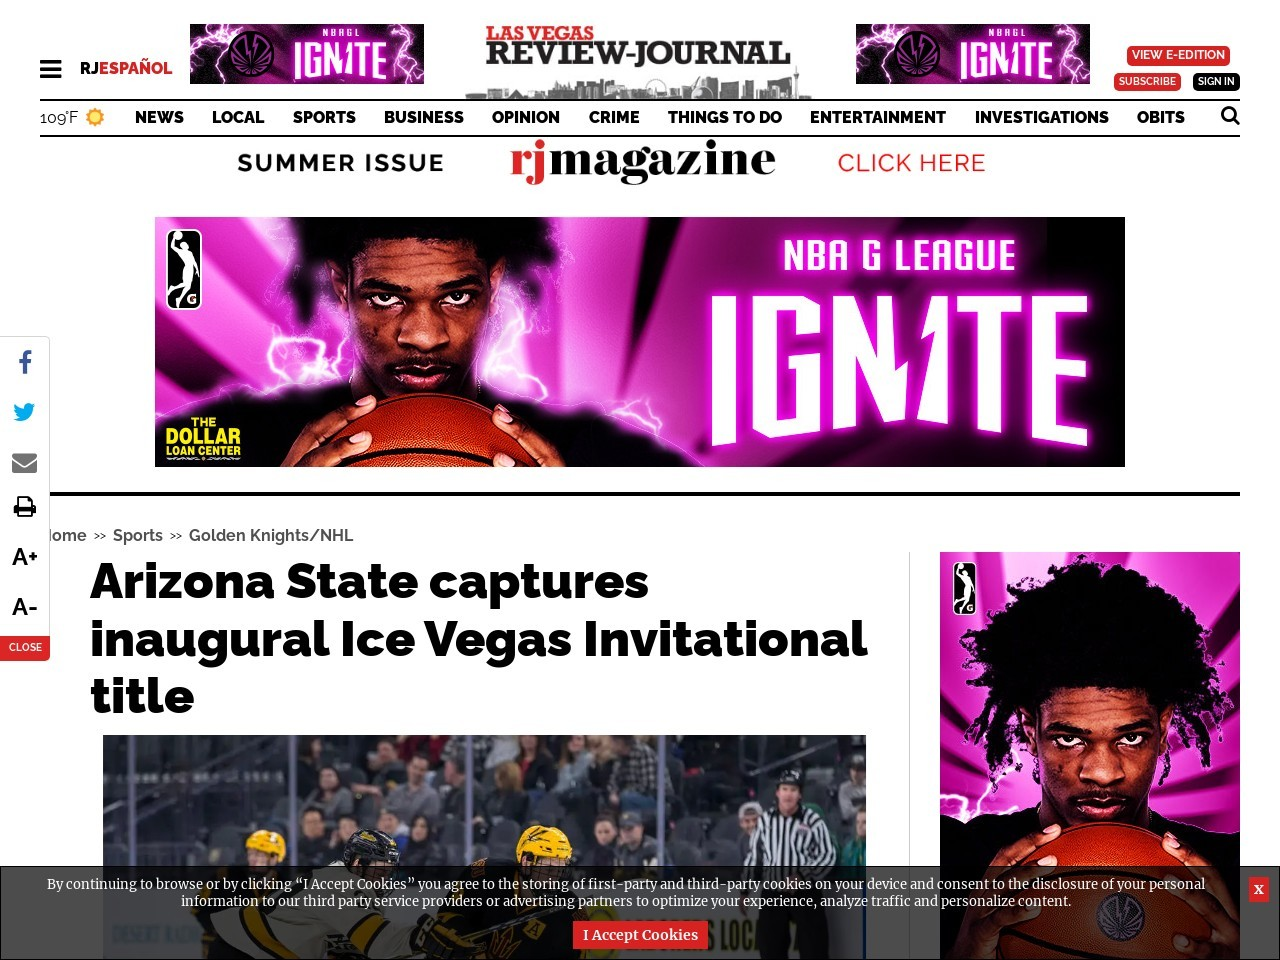 Arizona State captures inaugural Ice Vegas Invitational title